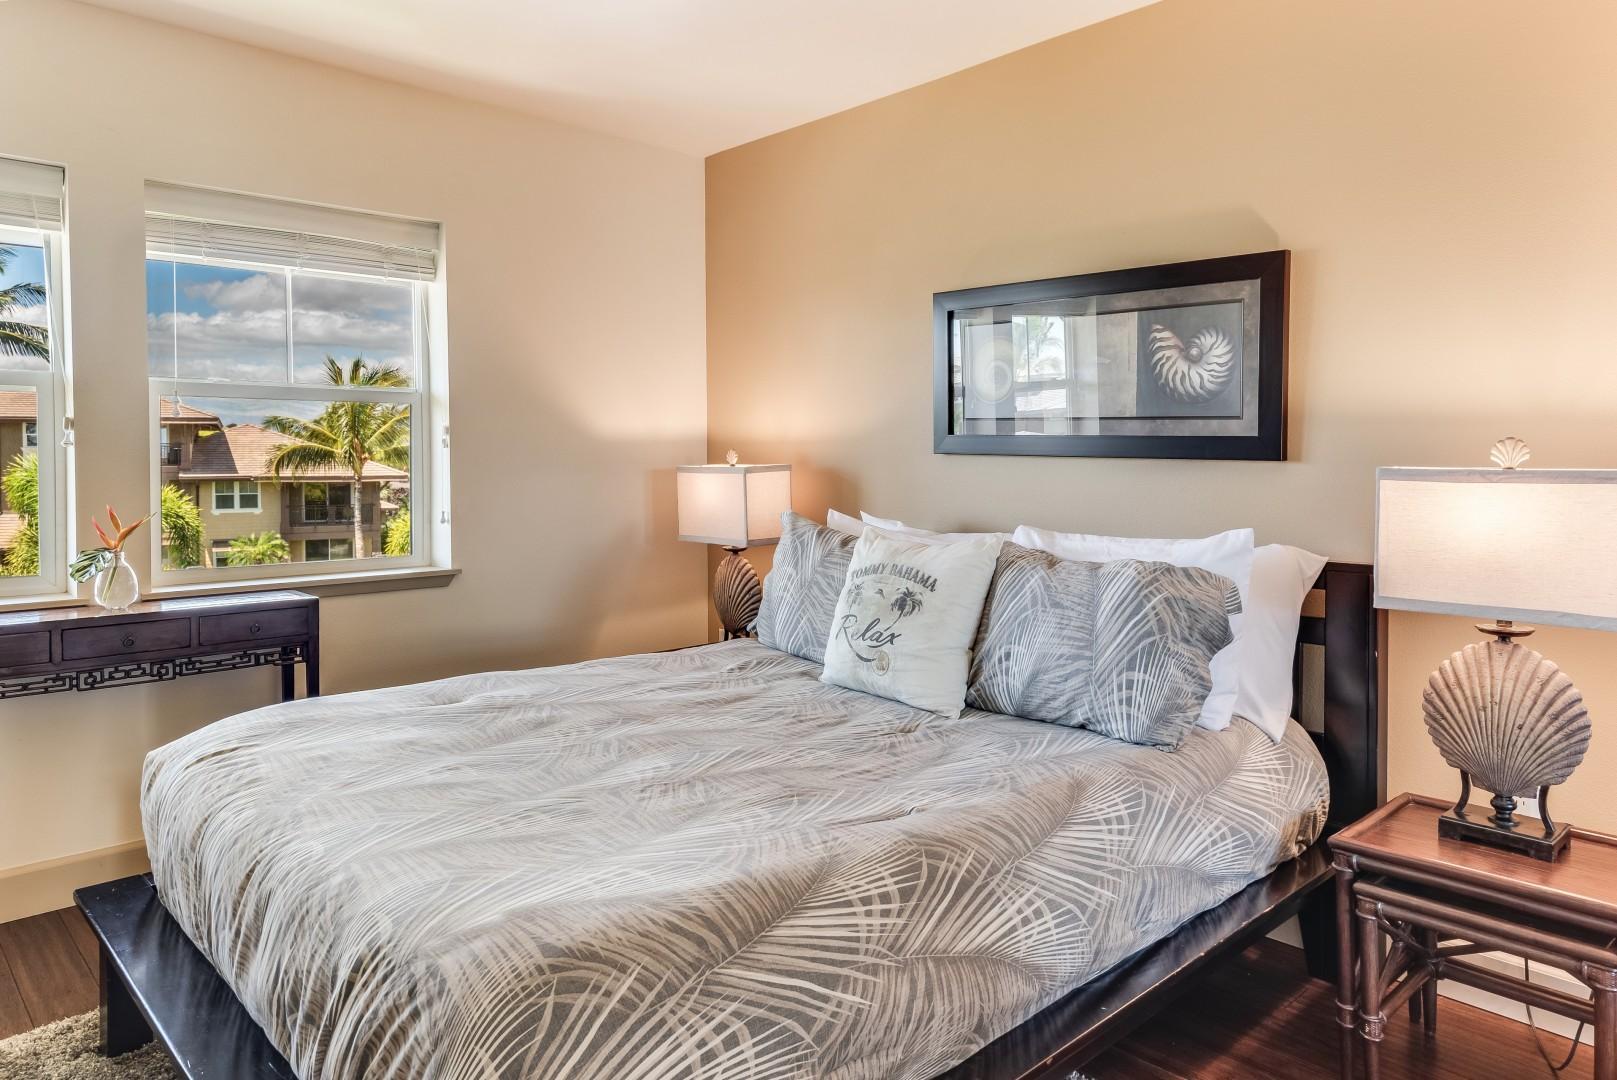 Upstairs guest bedroom 2 w/ queen size bed